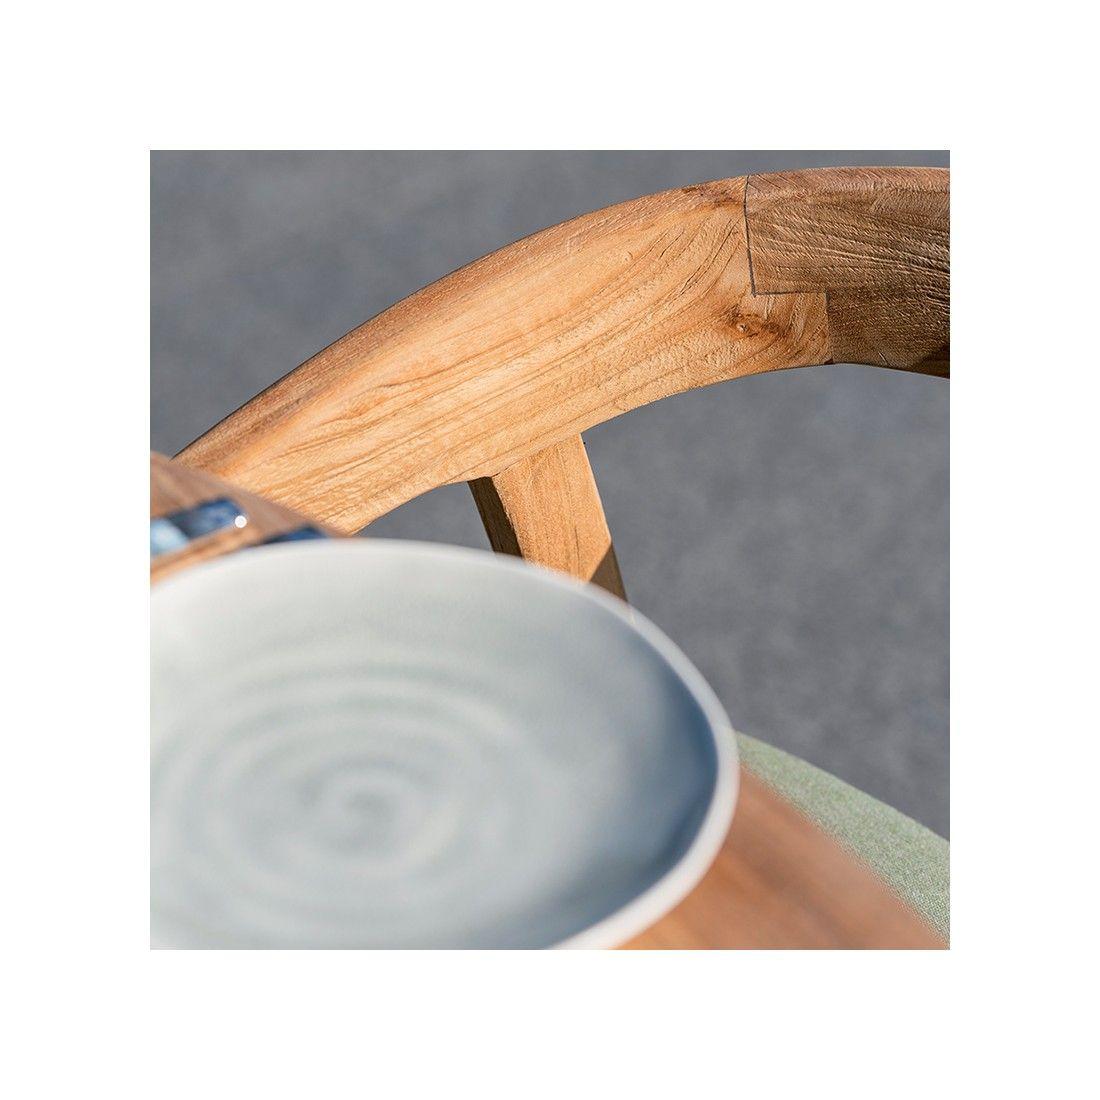 Fauteuil de table design en teck